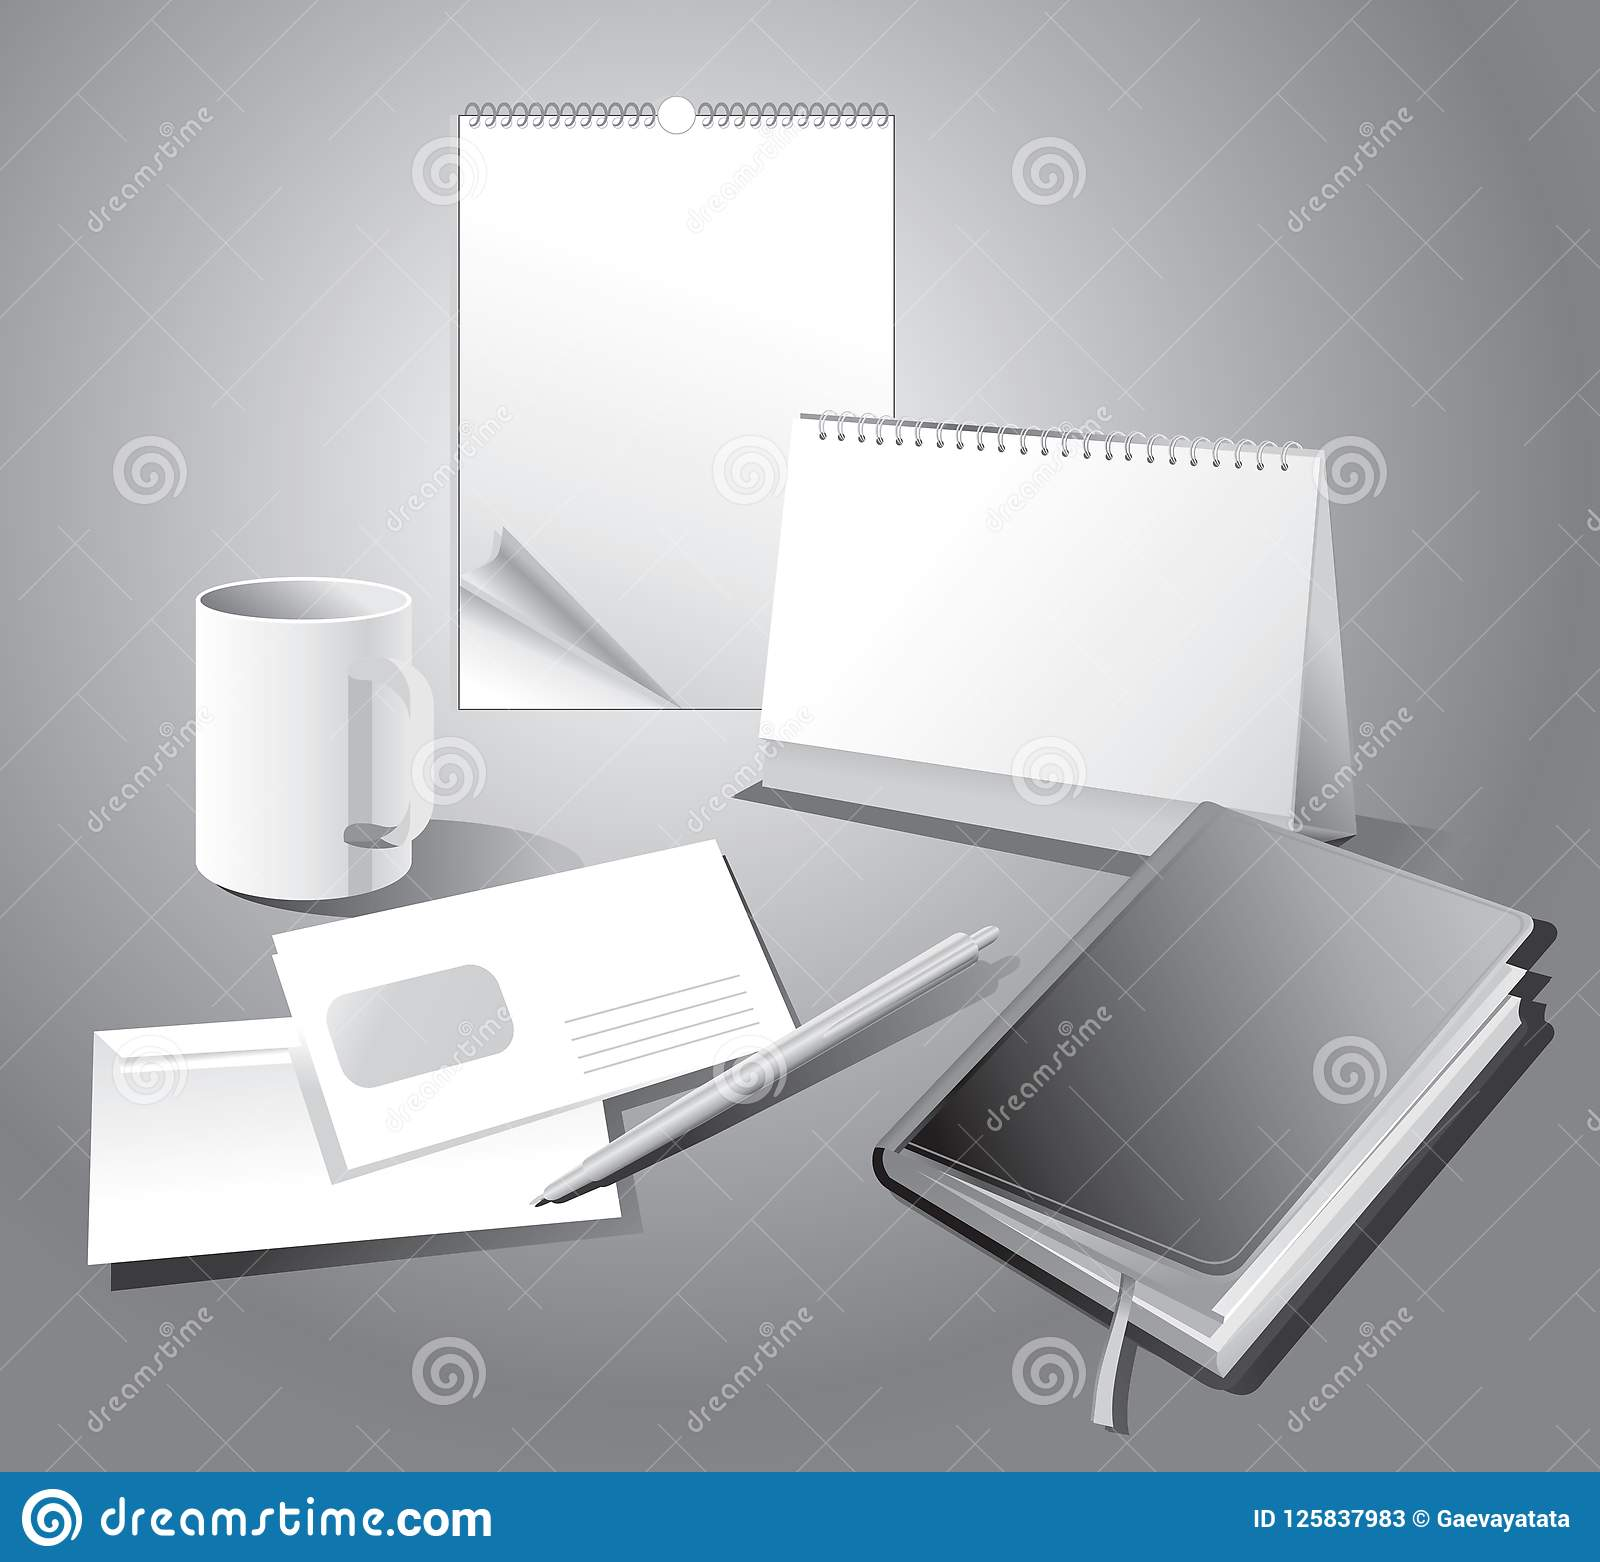 Corporate templates and calendar.